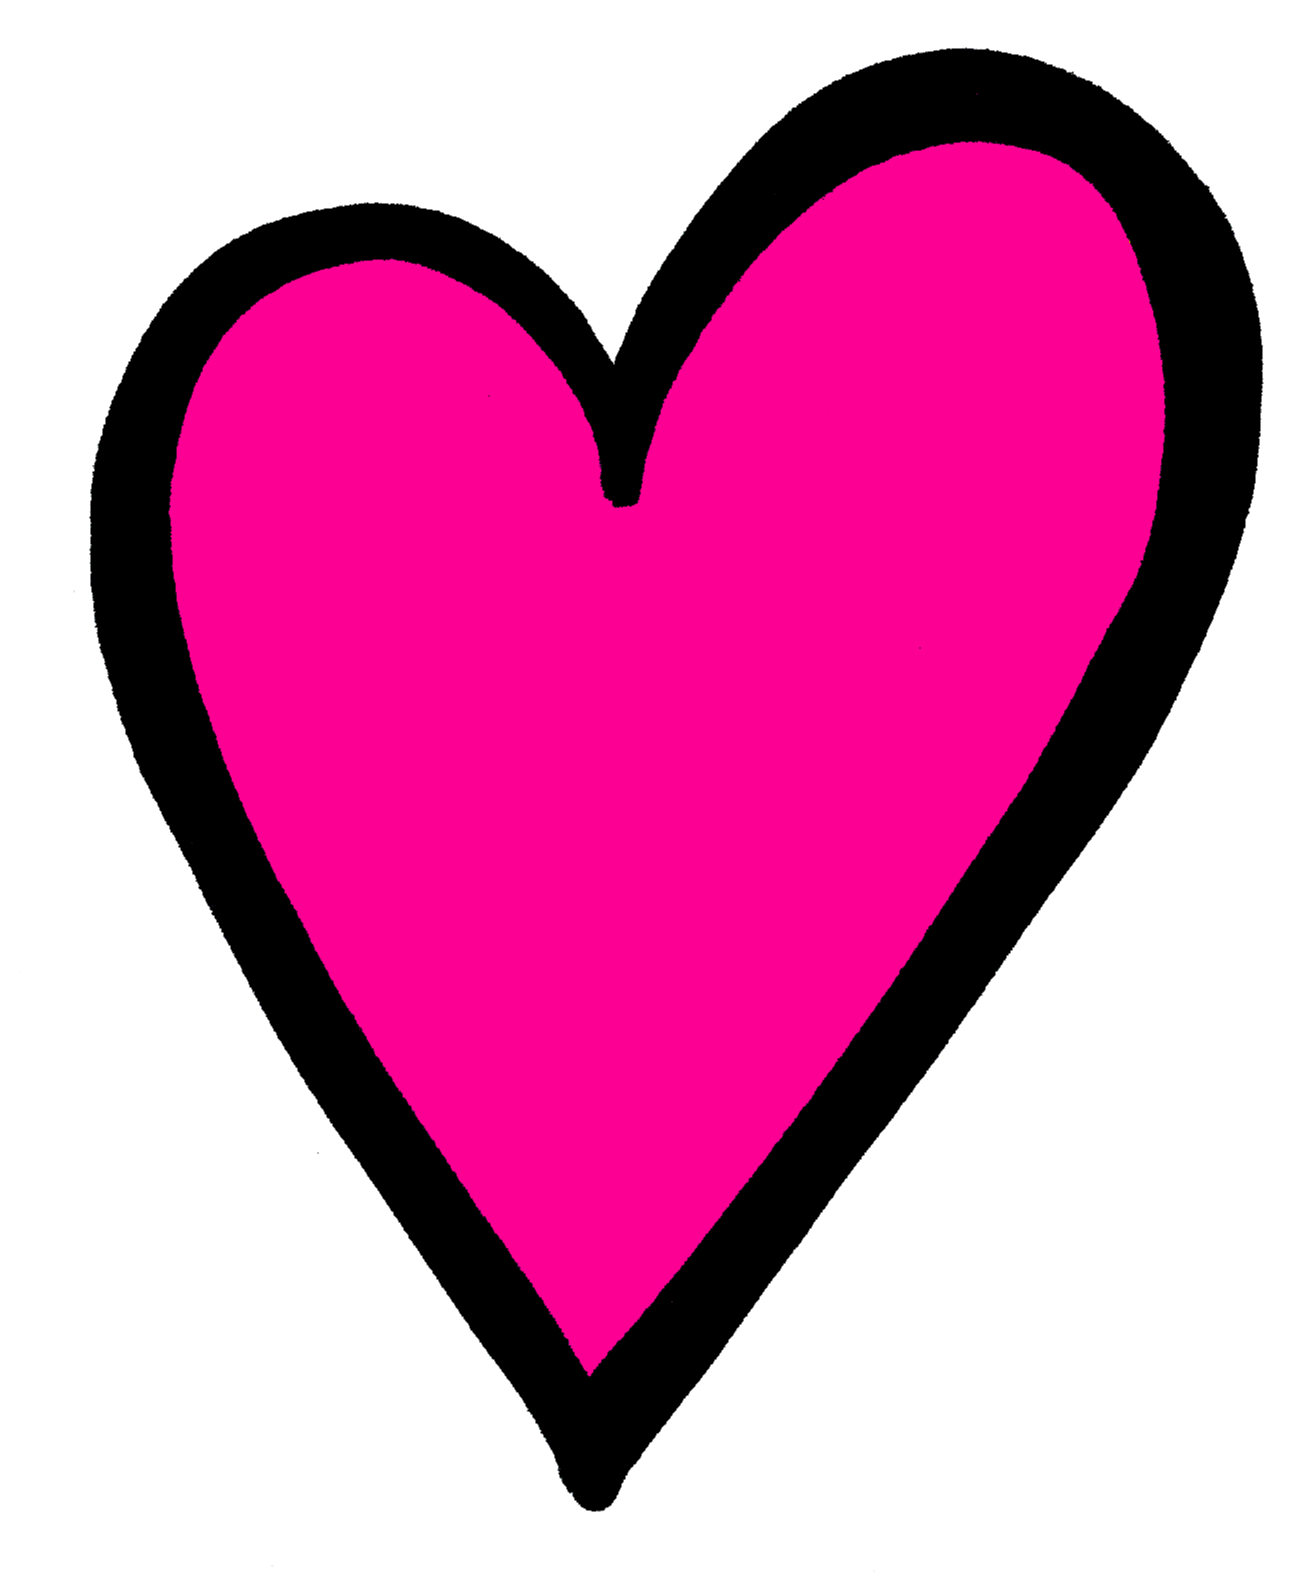 Pink Heart Png - ClipArt Best